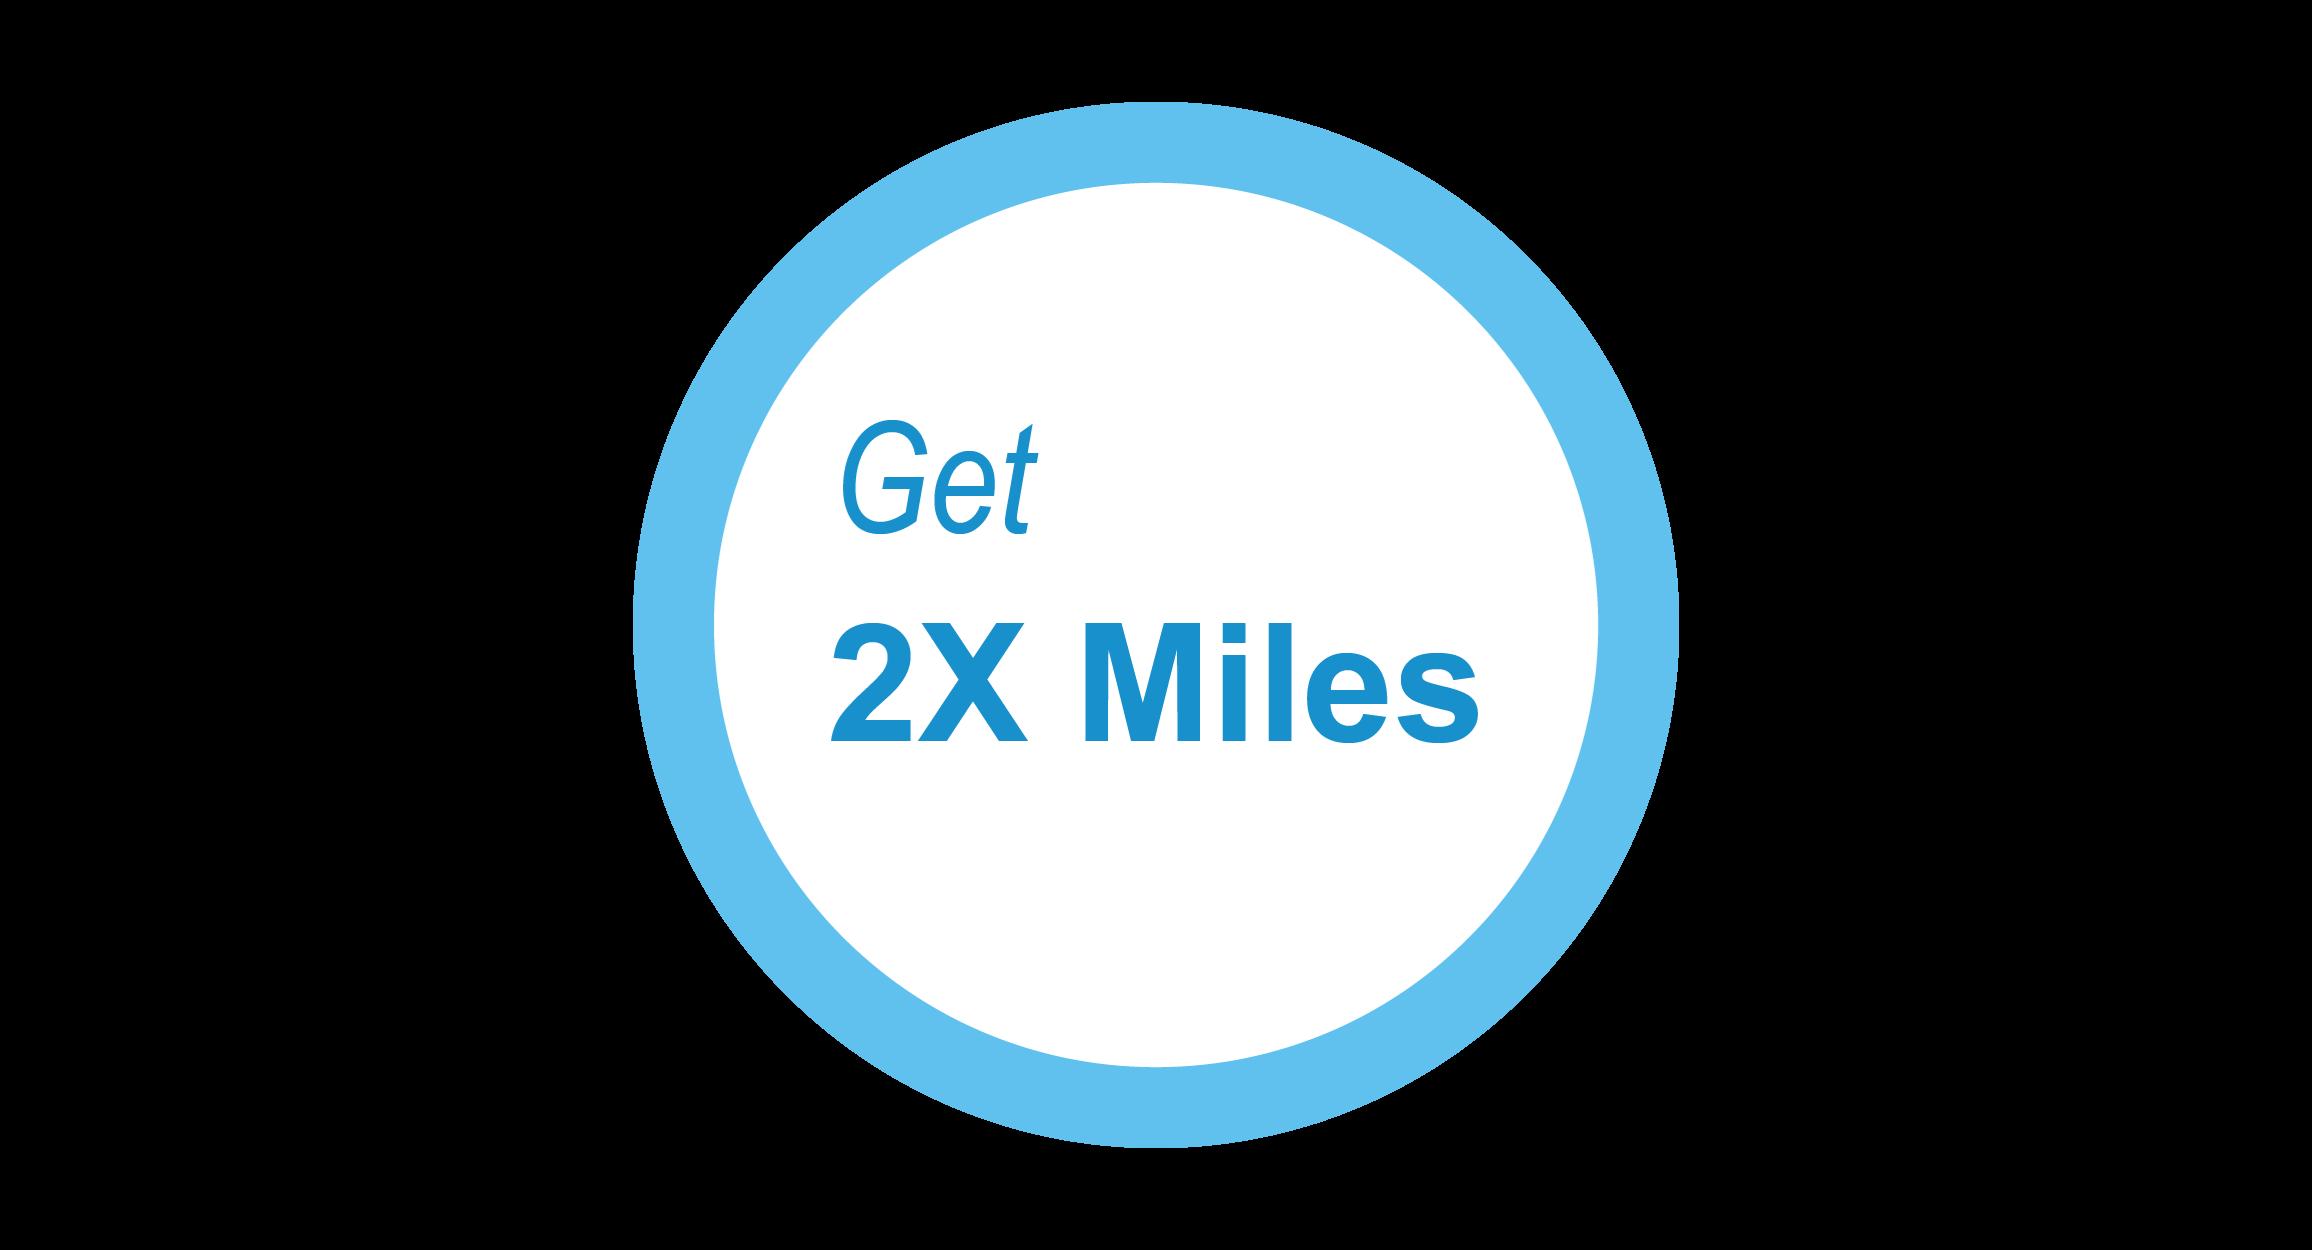 Get 2X Miles